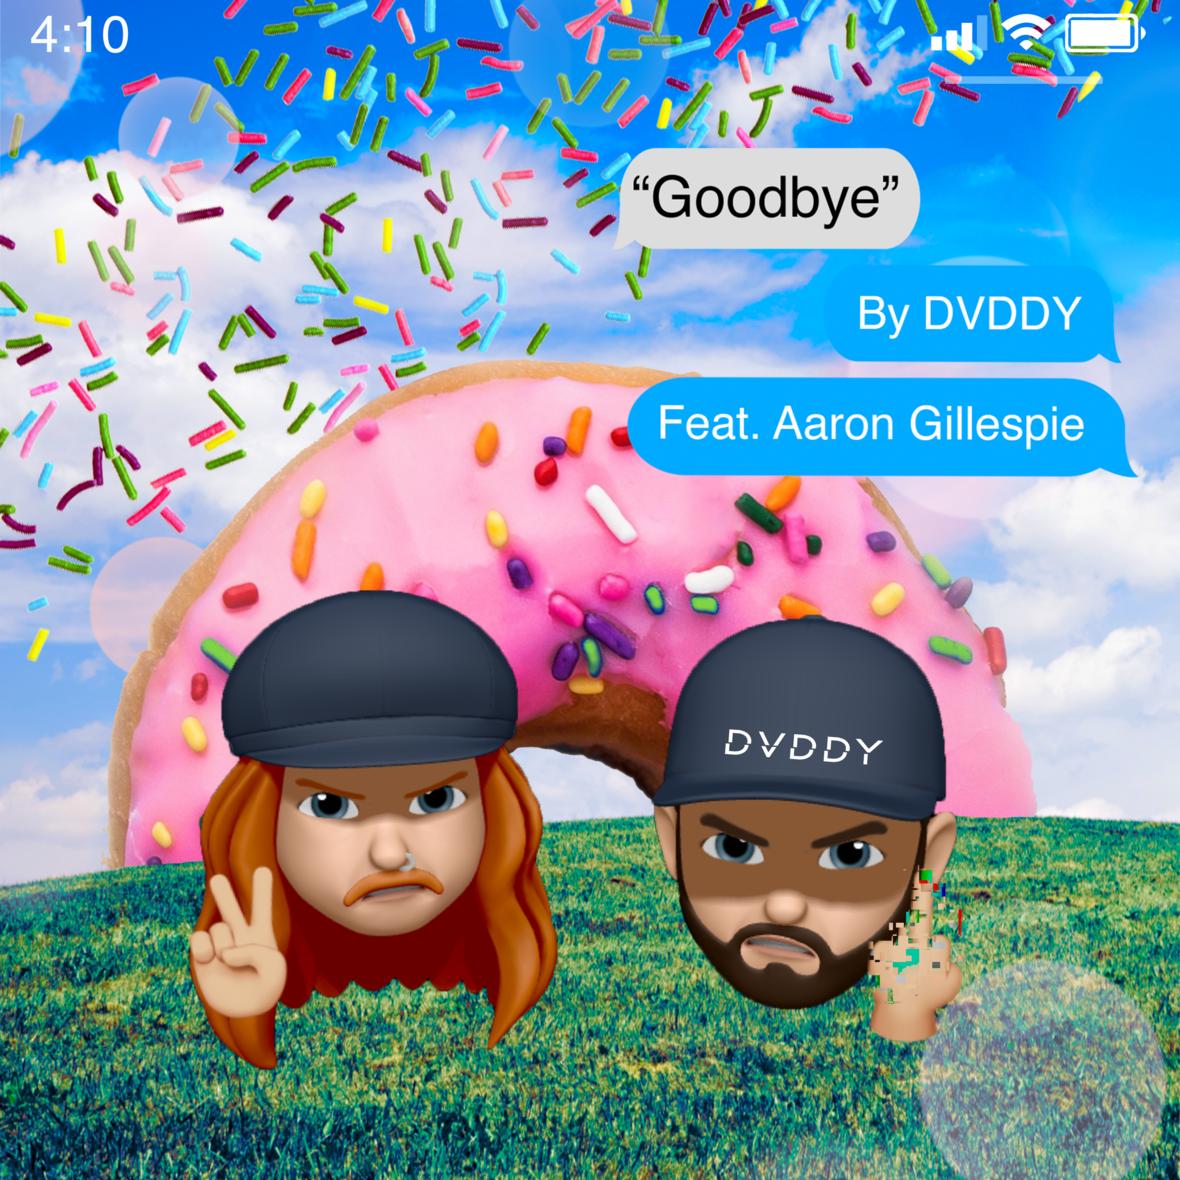 Goodbye.DVDDYfinaladjusted